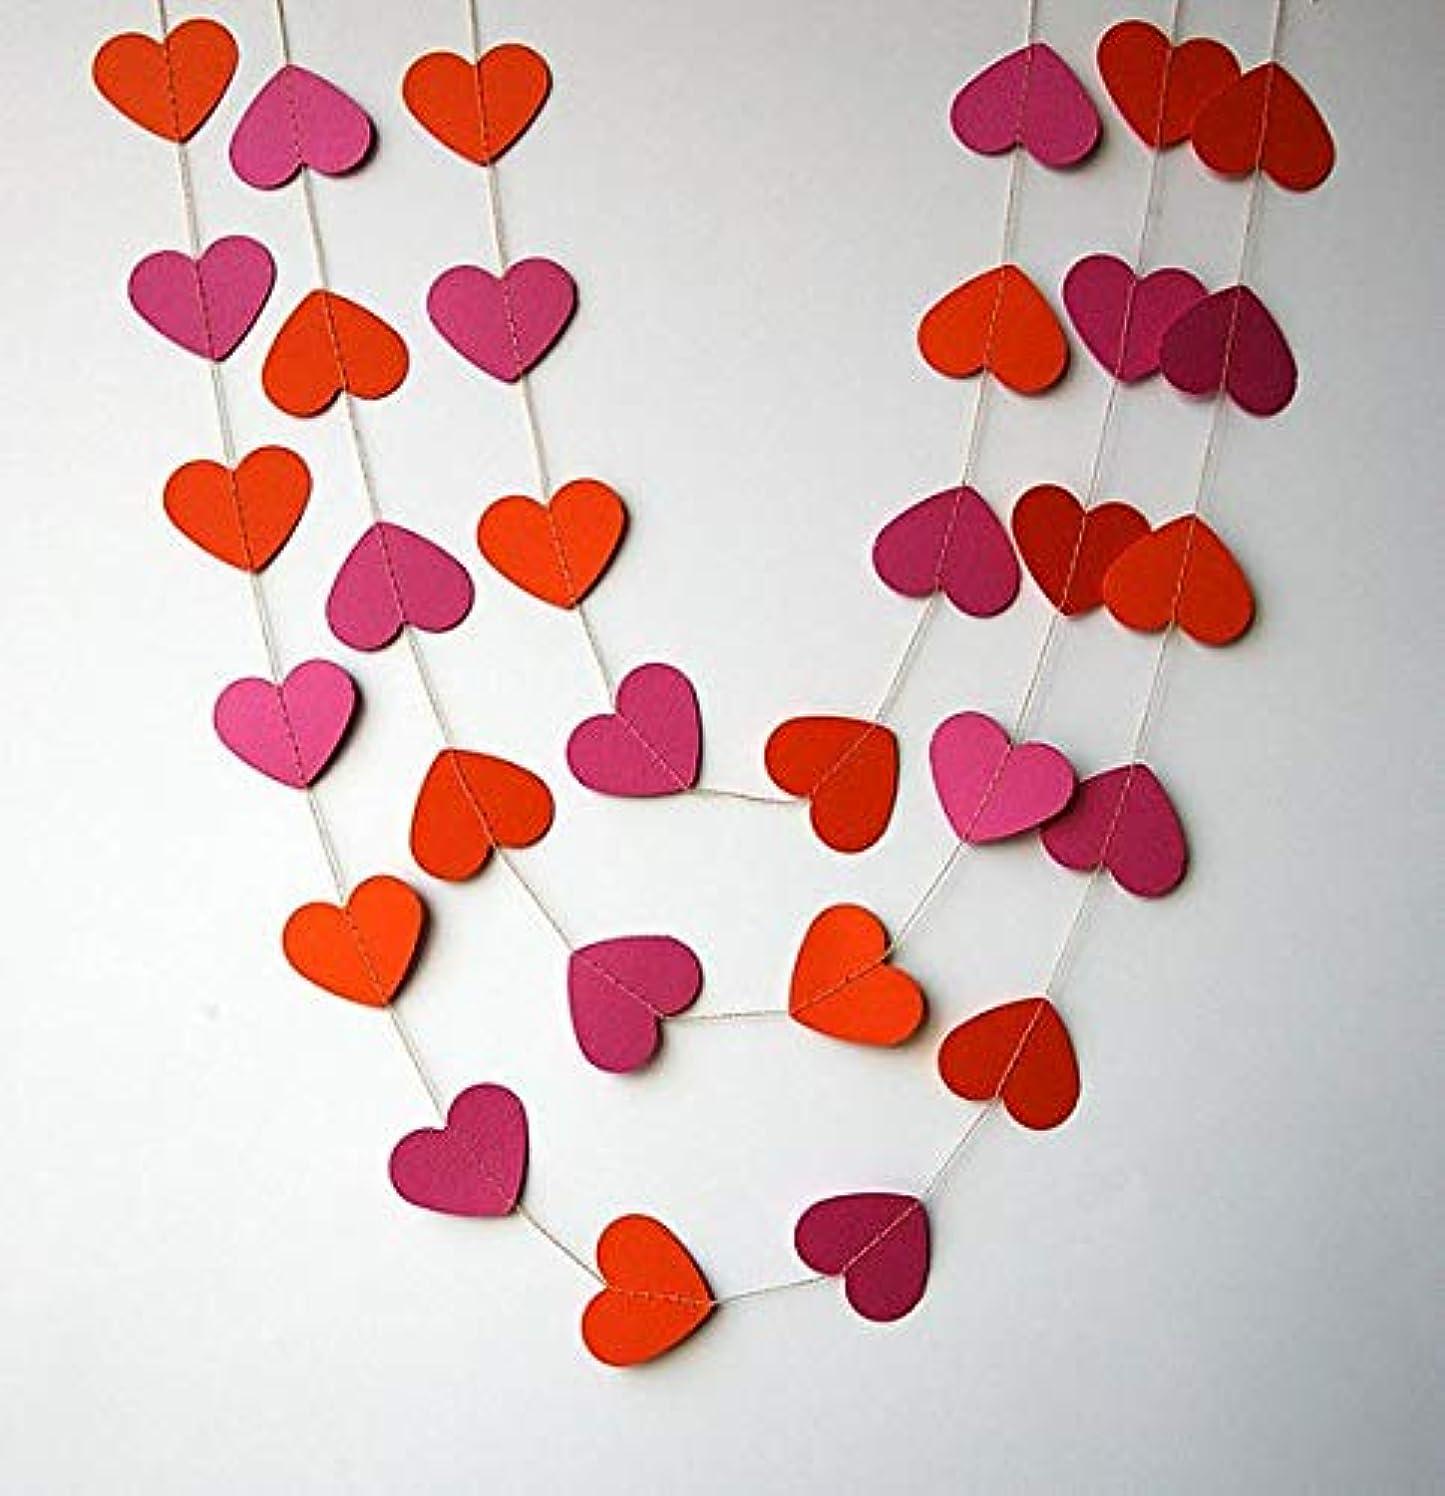 Pink & Orange Heart 10ft Party Paper Garland, Birthday Party Decor, Wedding Shower Decor, Nursery Décor